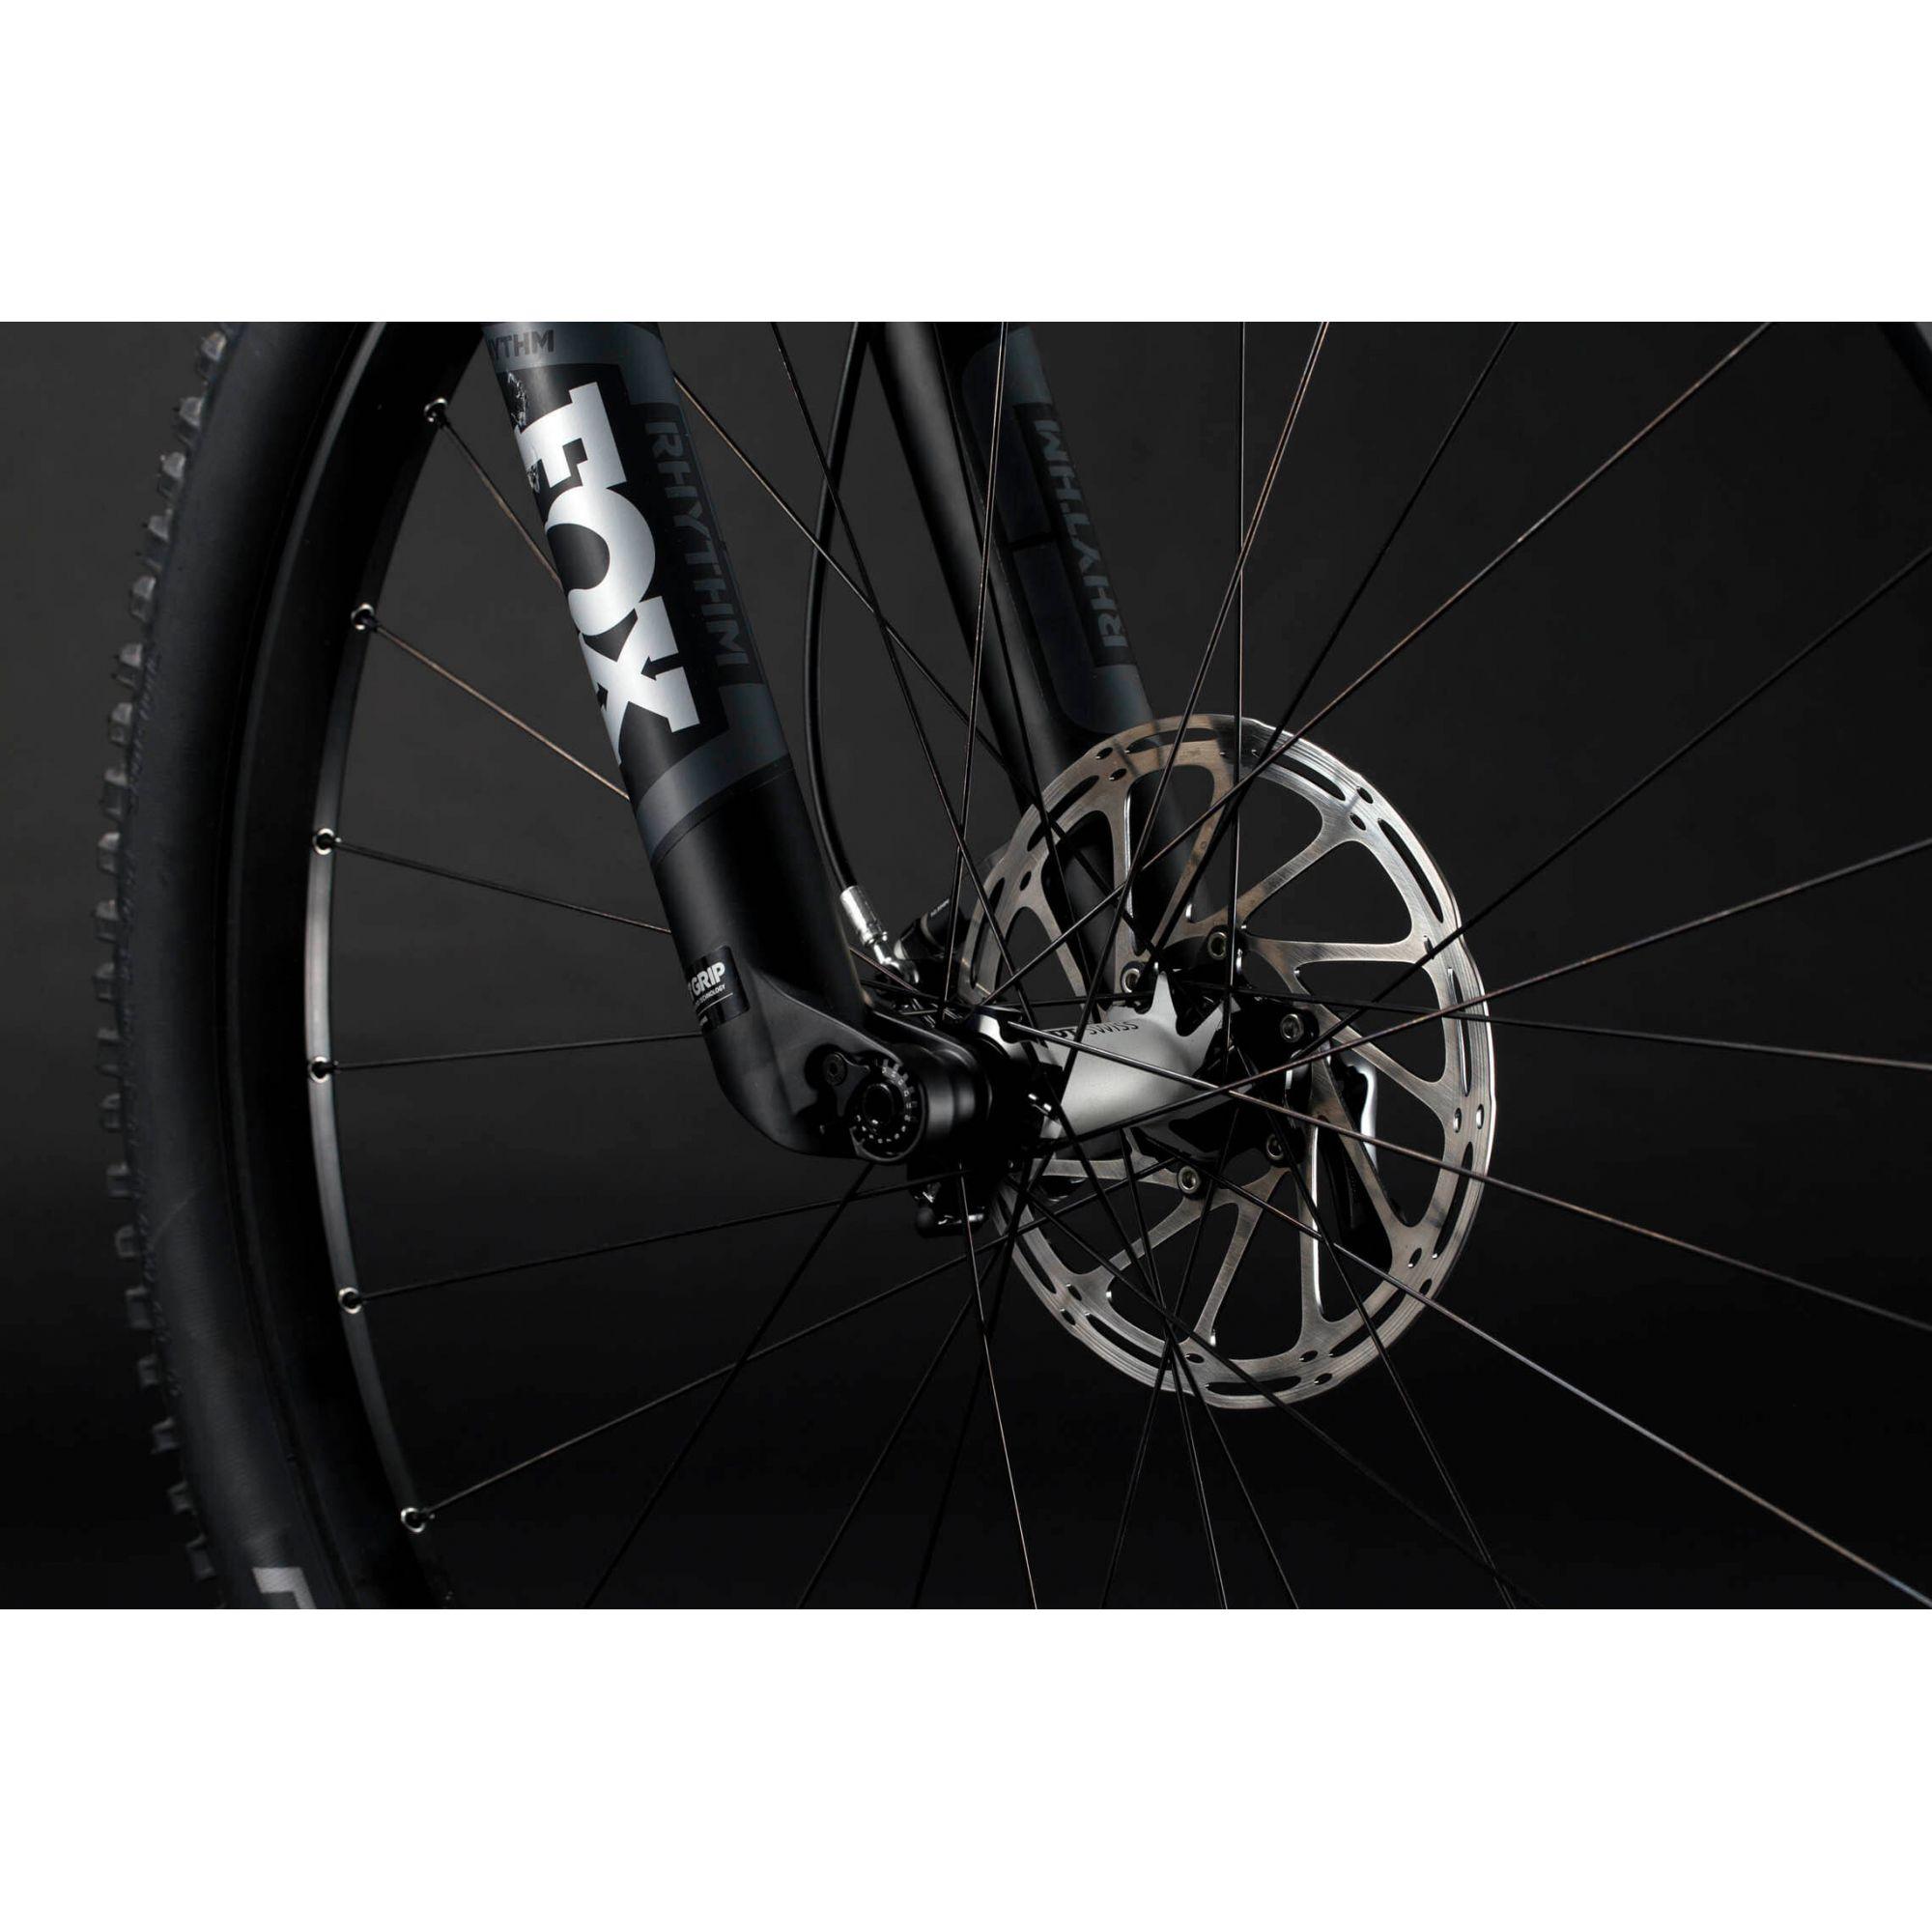 Bicicleta SENSE Exalt Evo 2020 - Preto/Acqua